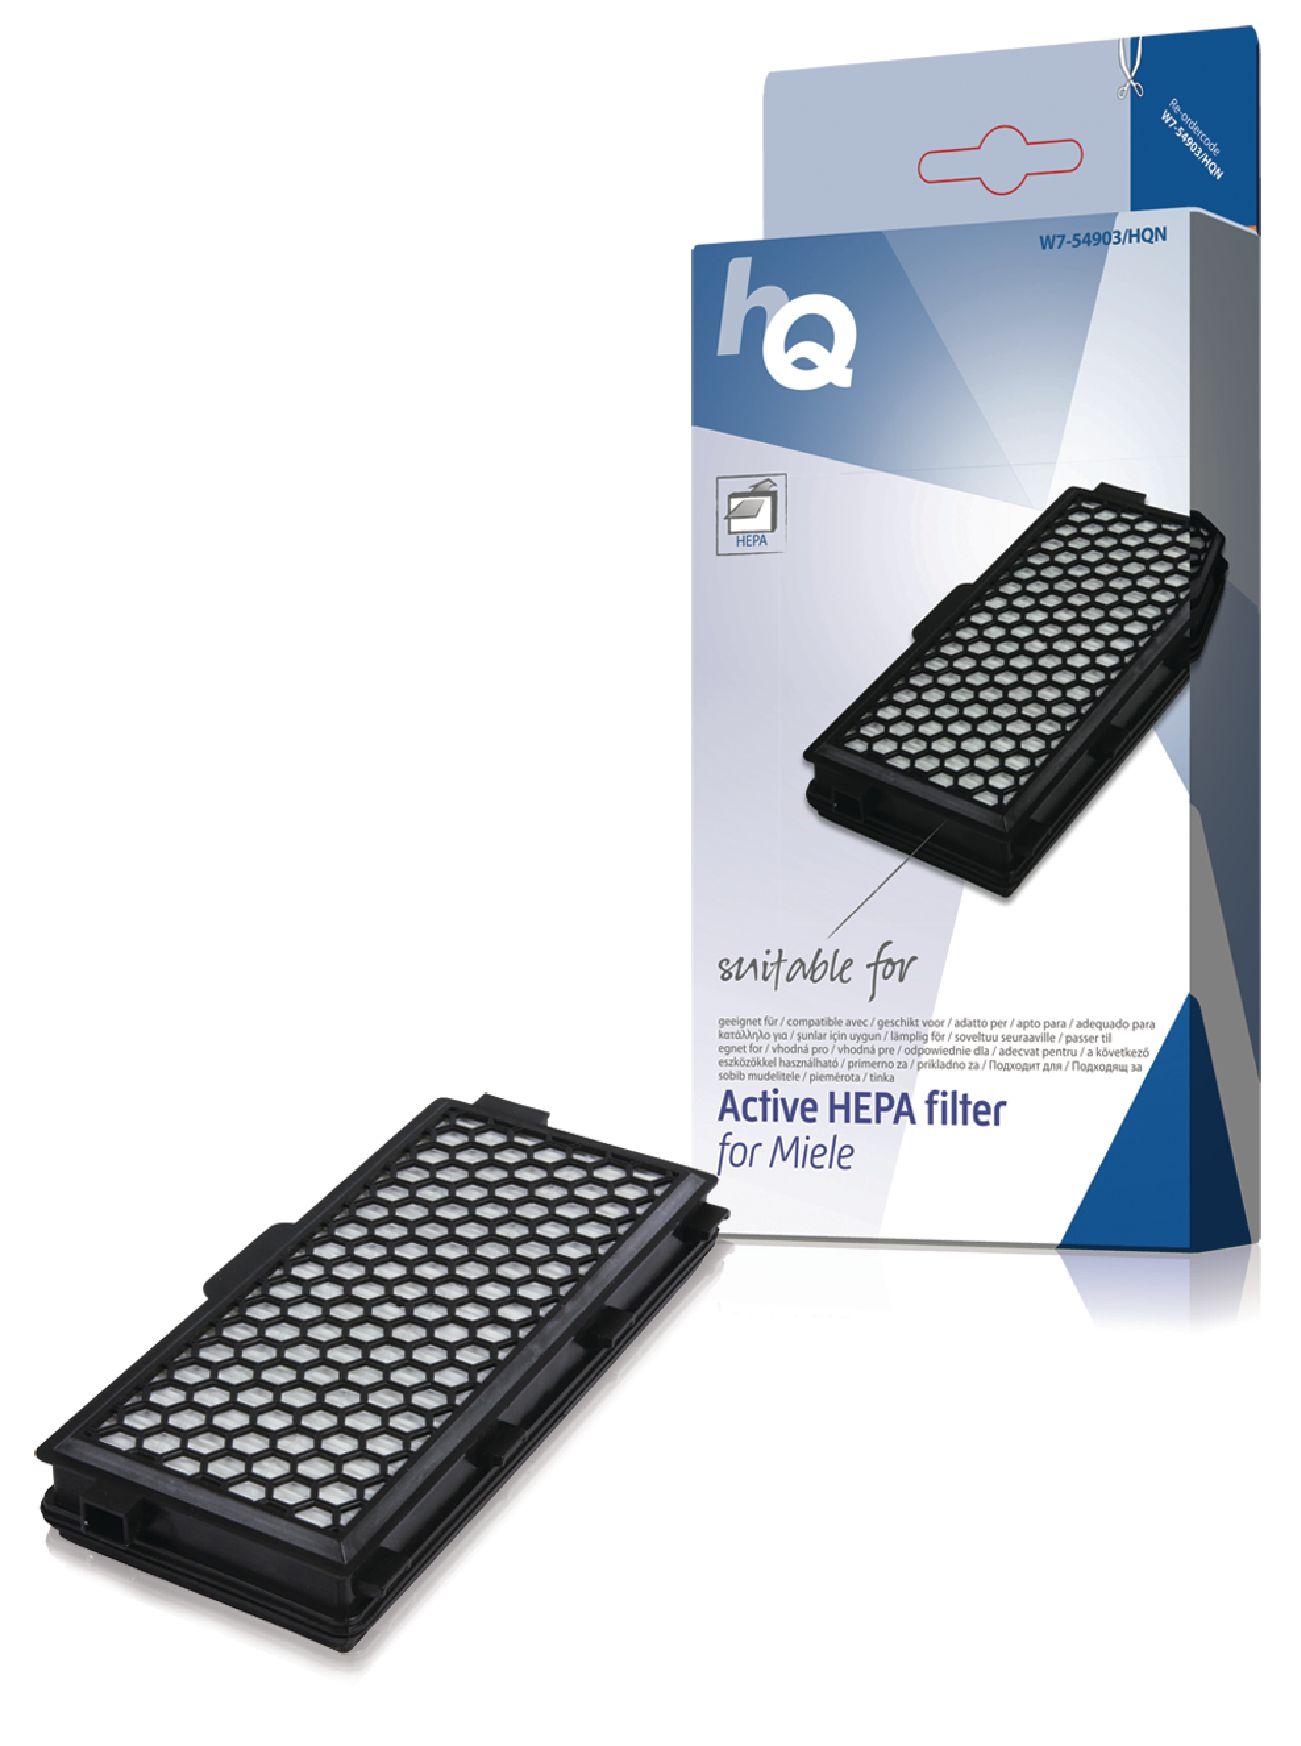 S5260 SF-AH50 SF-AH 50 Hepa H12 Filter Pollenfilter Miele S5260 COMFORT